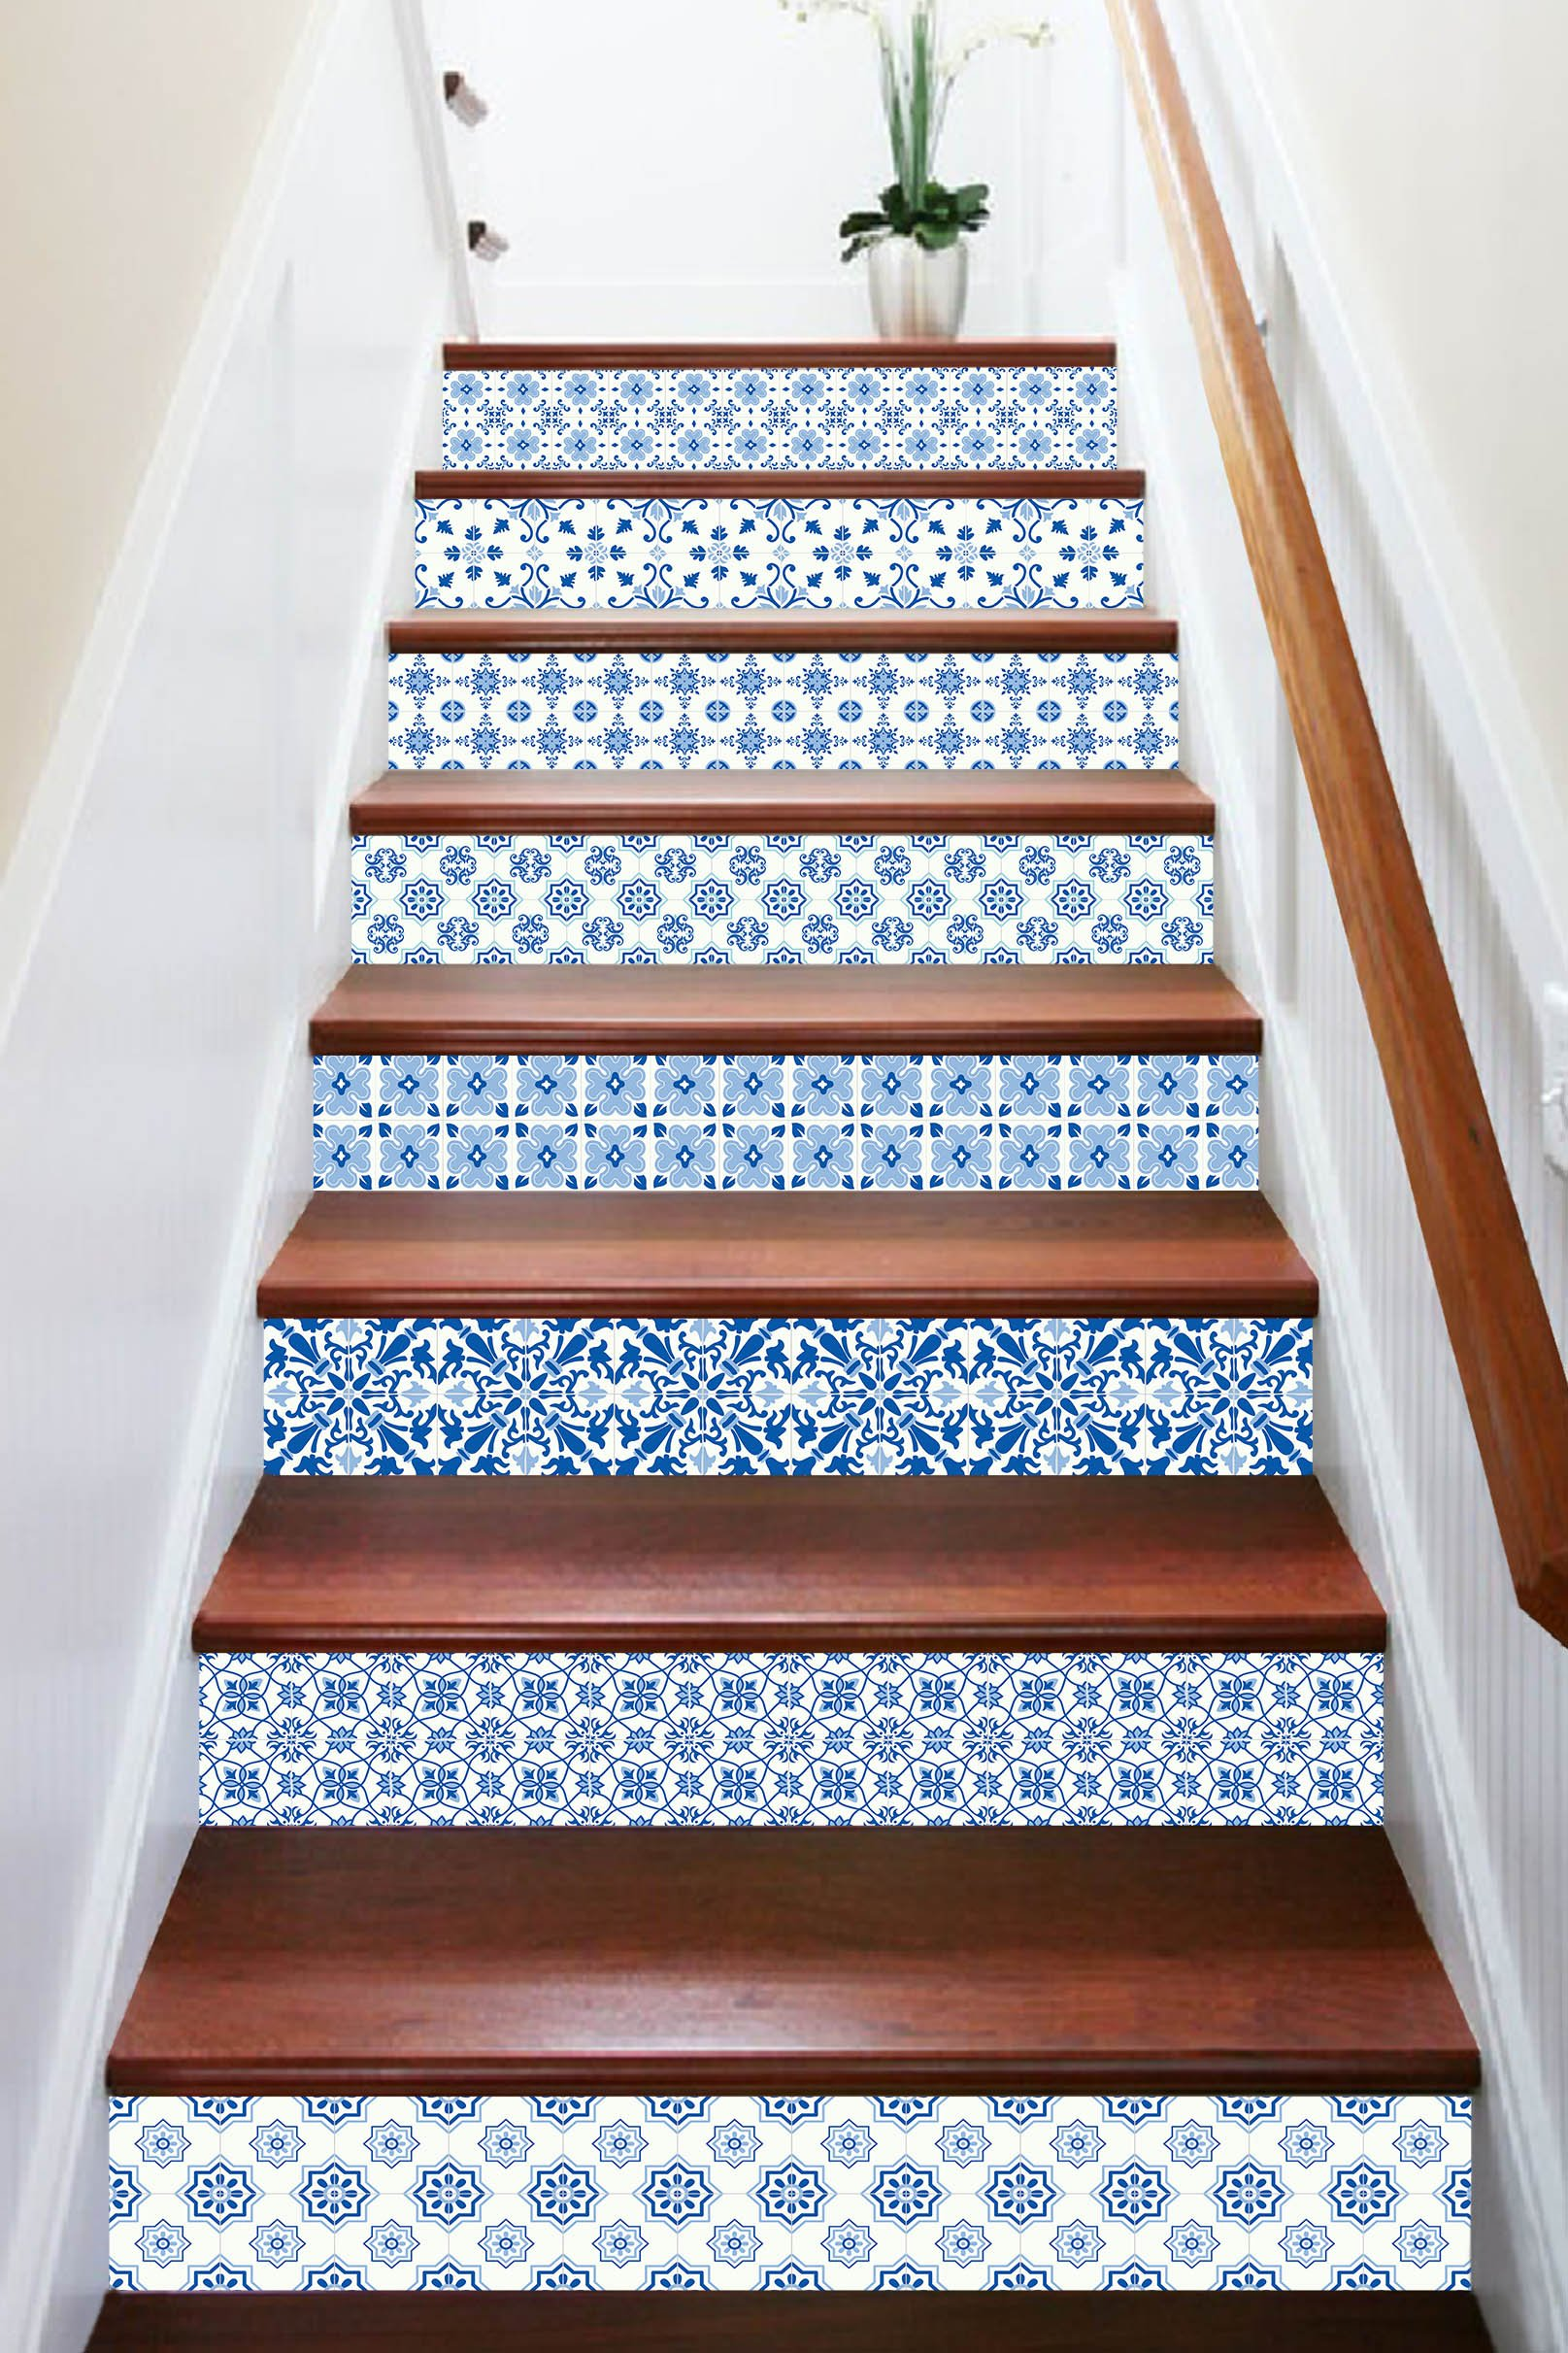 3D Clear Blue Pattern 7843 Stair Risers Decoration Photo Mural Vinyl Decal Wallpaper Murals Wallpaper Mural US Lemon (15x H:18cm x W:94cm (7''x37'')) by AJ WALLPAPER